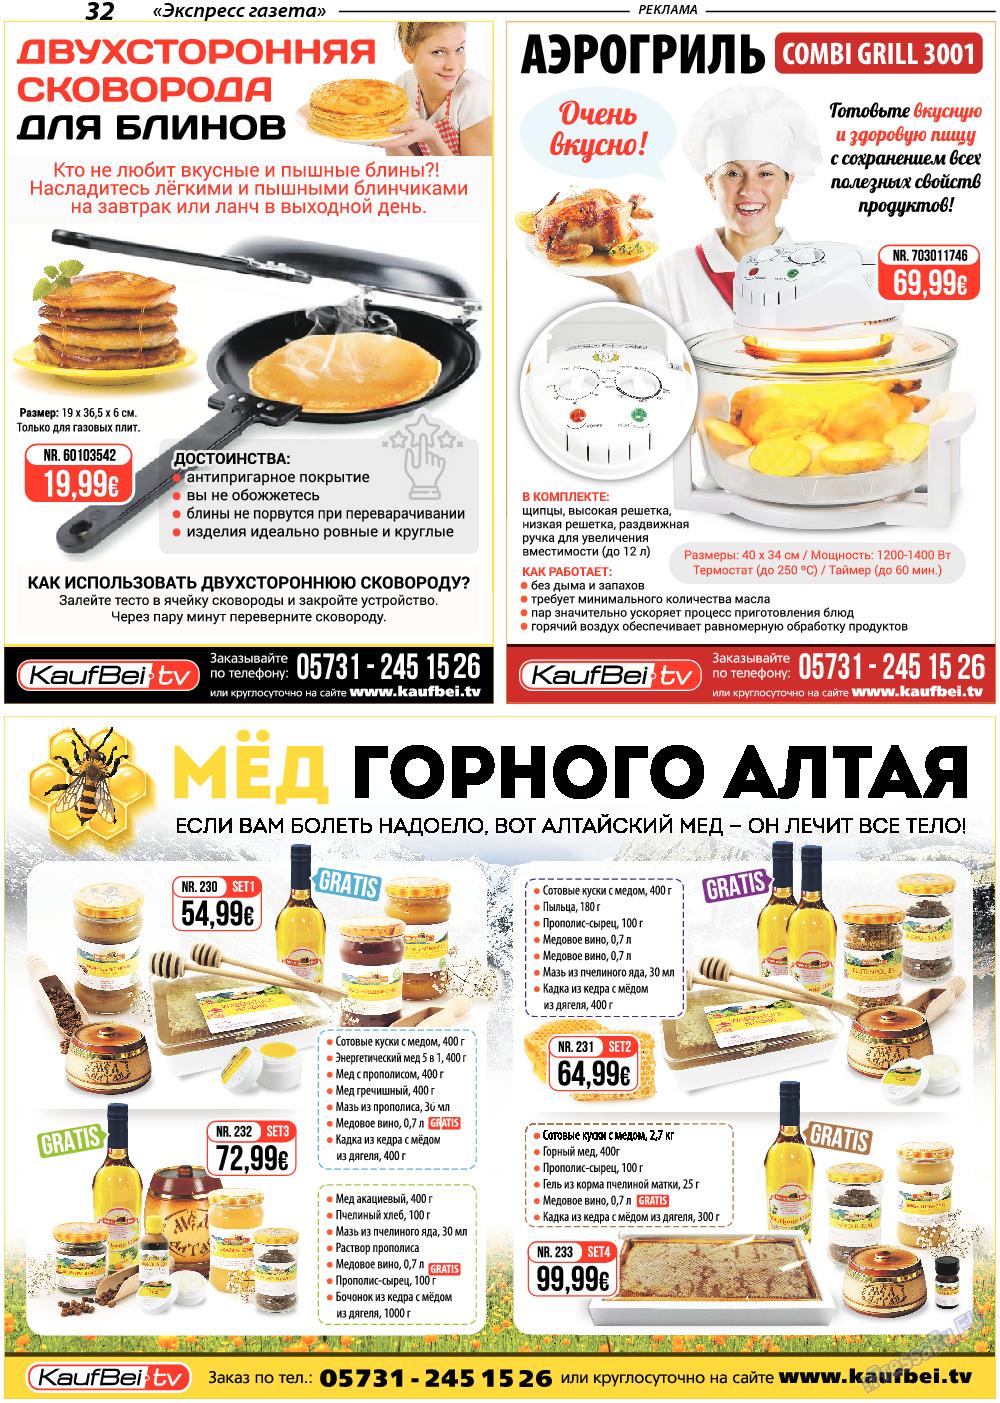 Экспресс газета (газета). 2017 год, номер 11, стр. 32